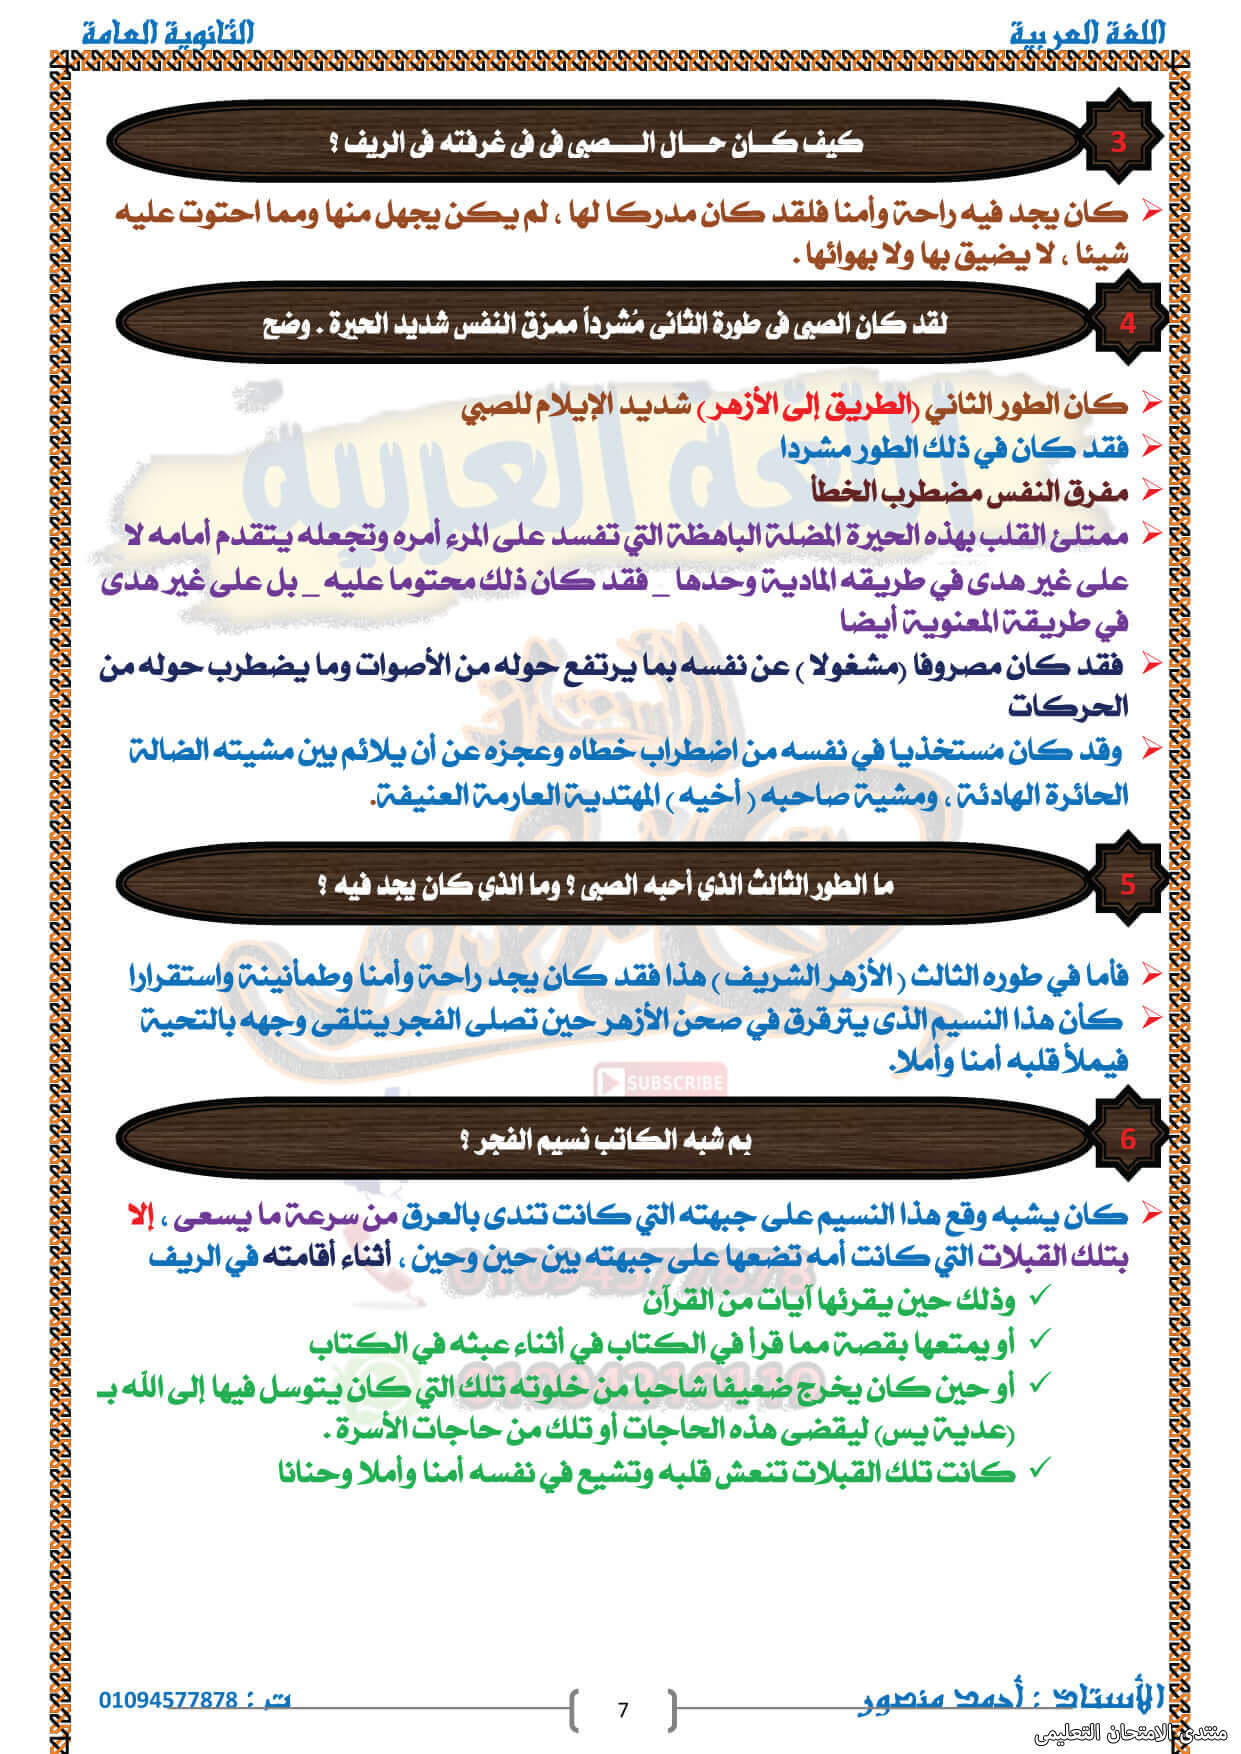 exam-eg.com_162025014490752.jpg